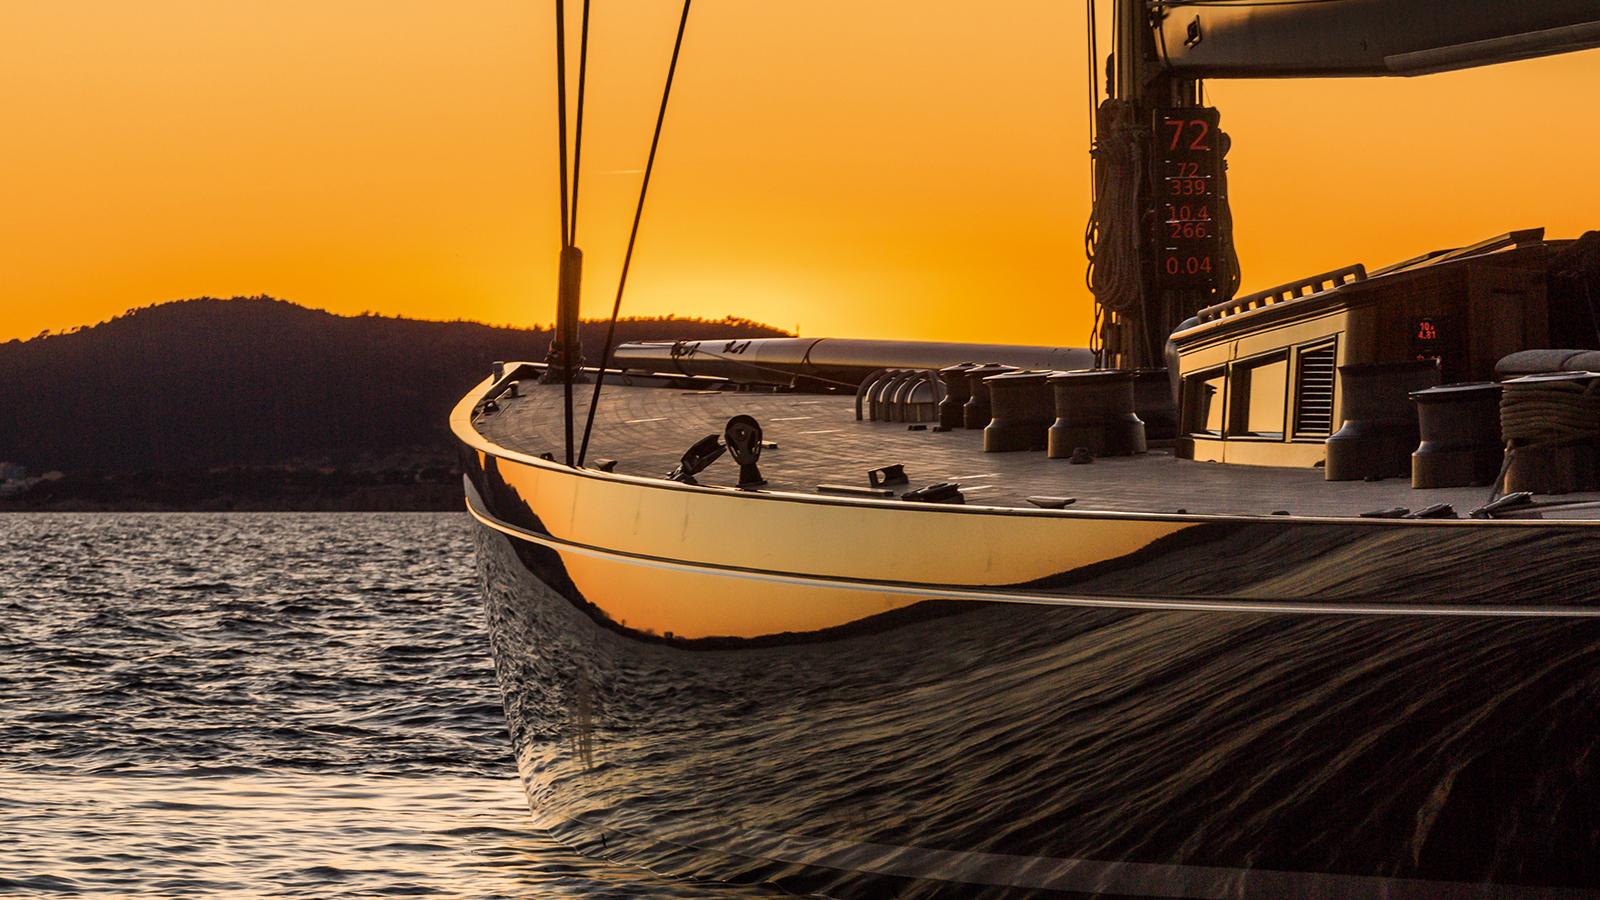 the-j-class-sailing-yacht-svea-at-sunset-credit-carlo-borlenghi